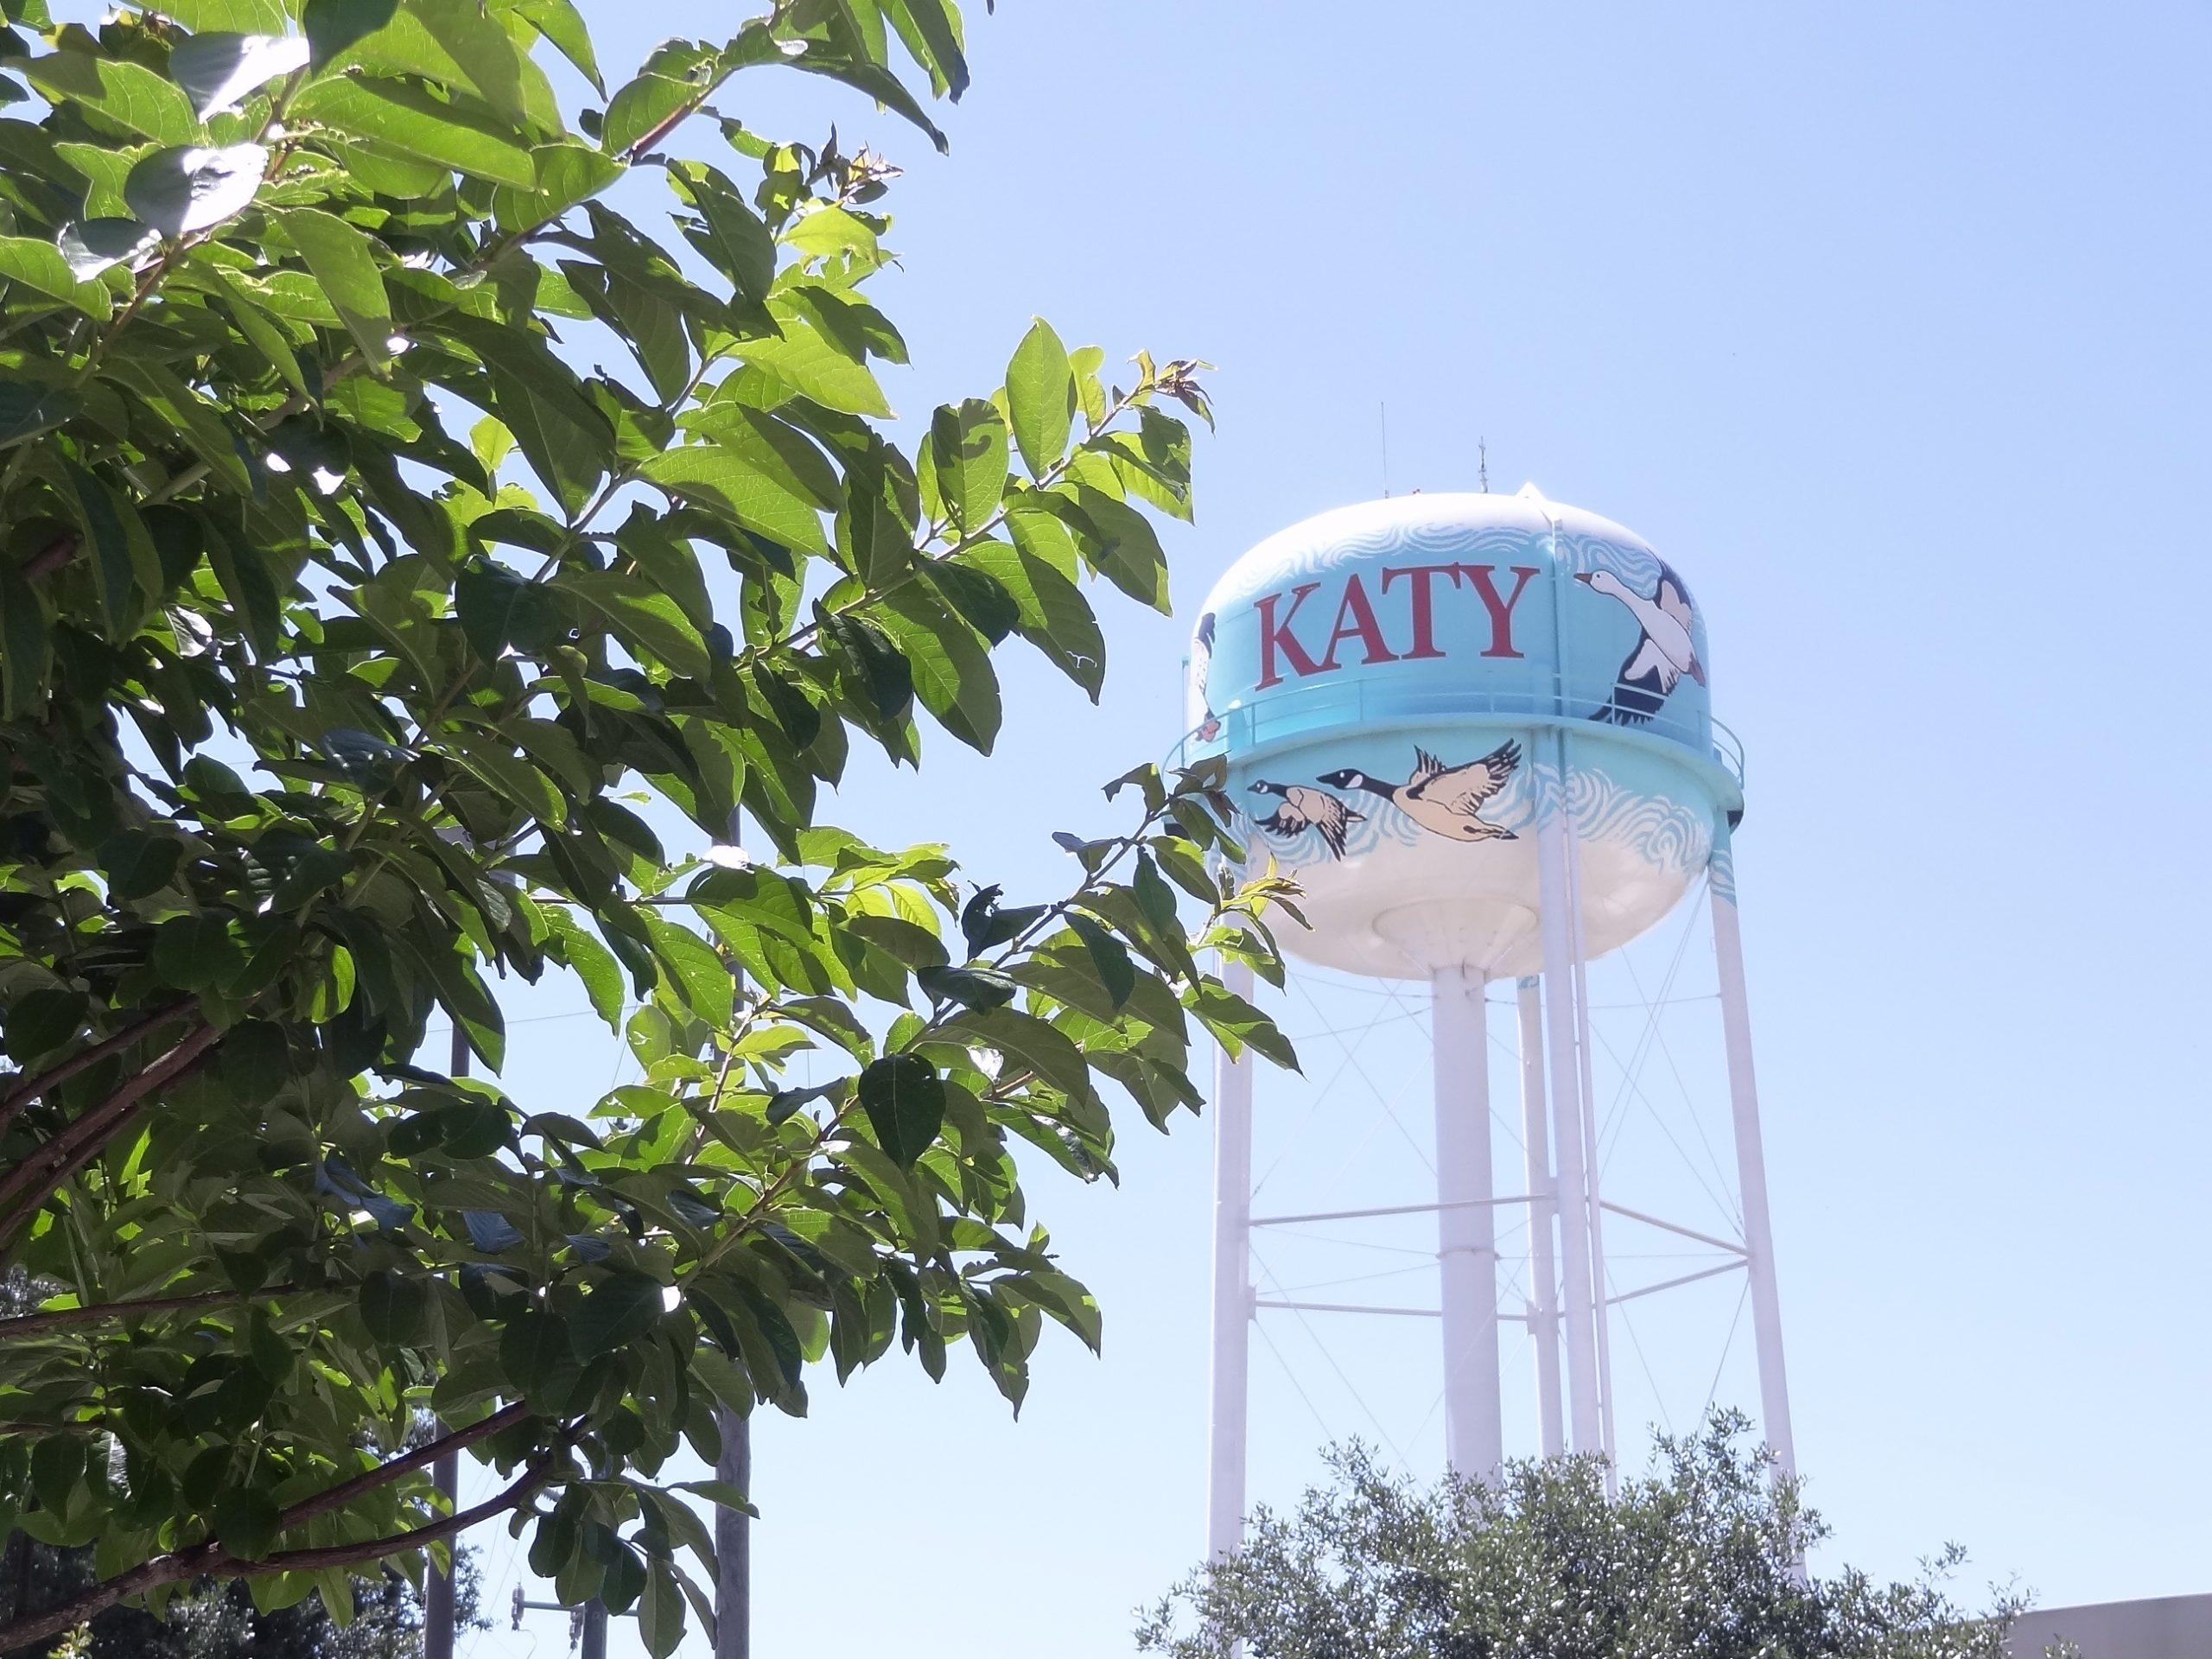 katy-water-tower3